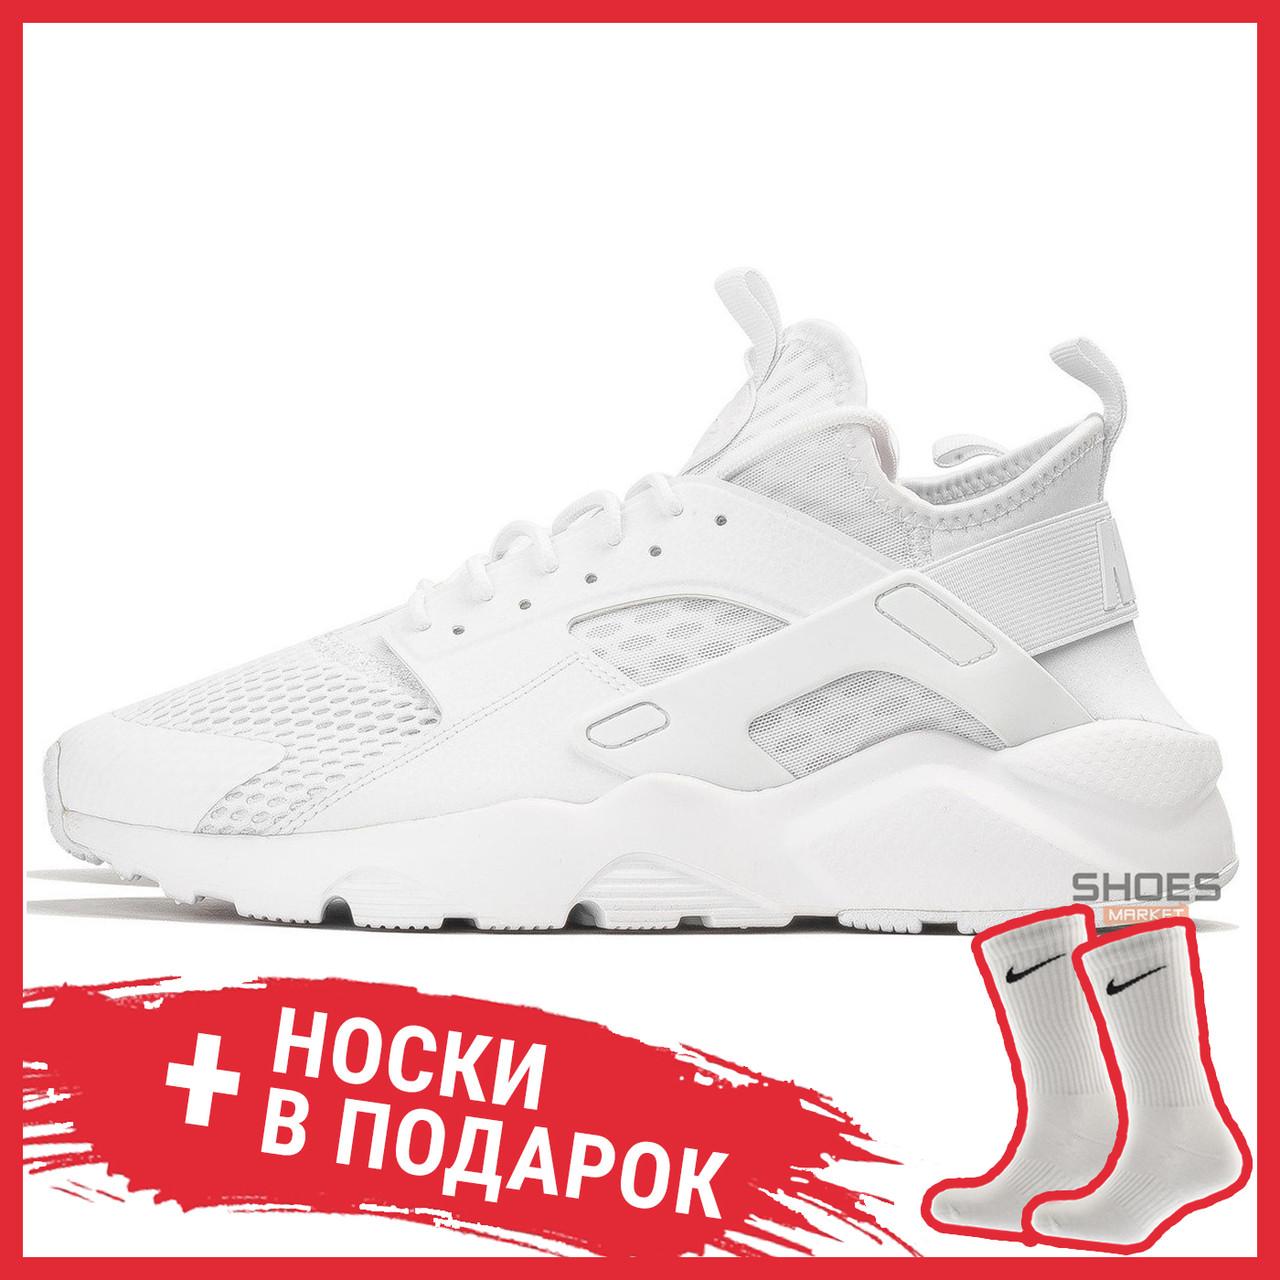 Мужские кроссовки Nike Air Huarache Ultra BR Triple White 833147-100, Найк Аир Хуарачи